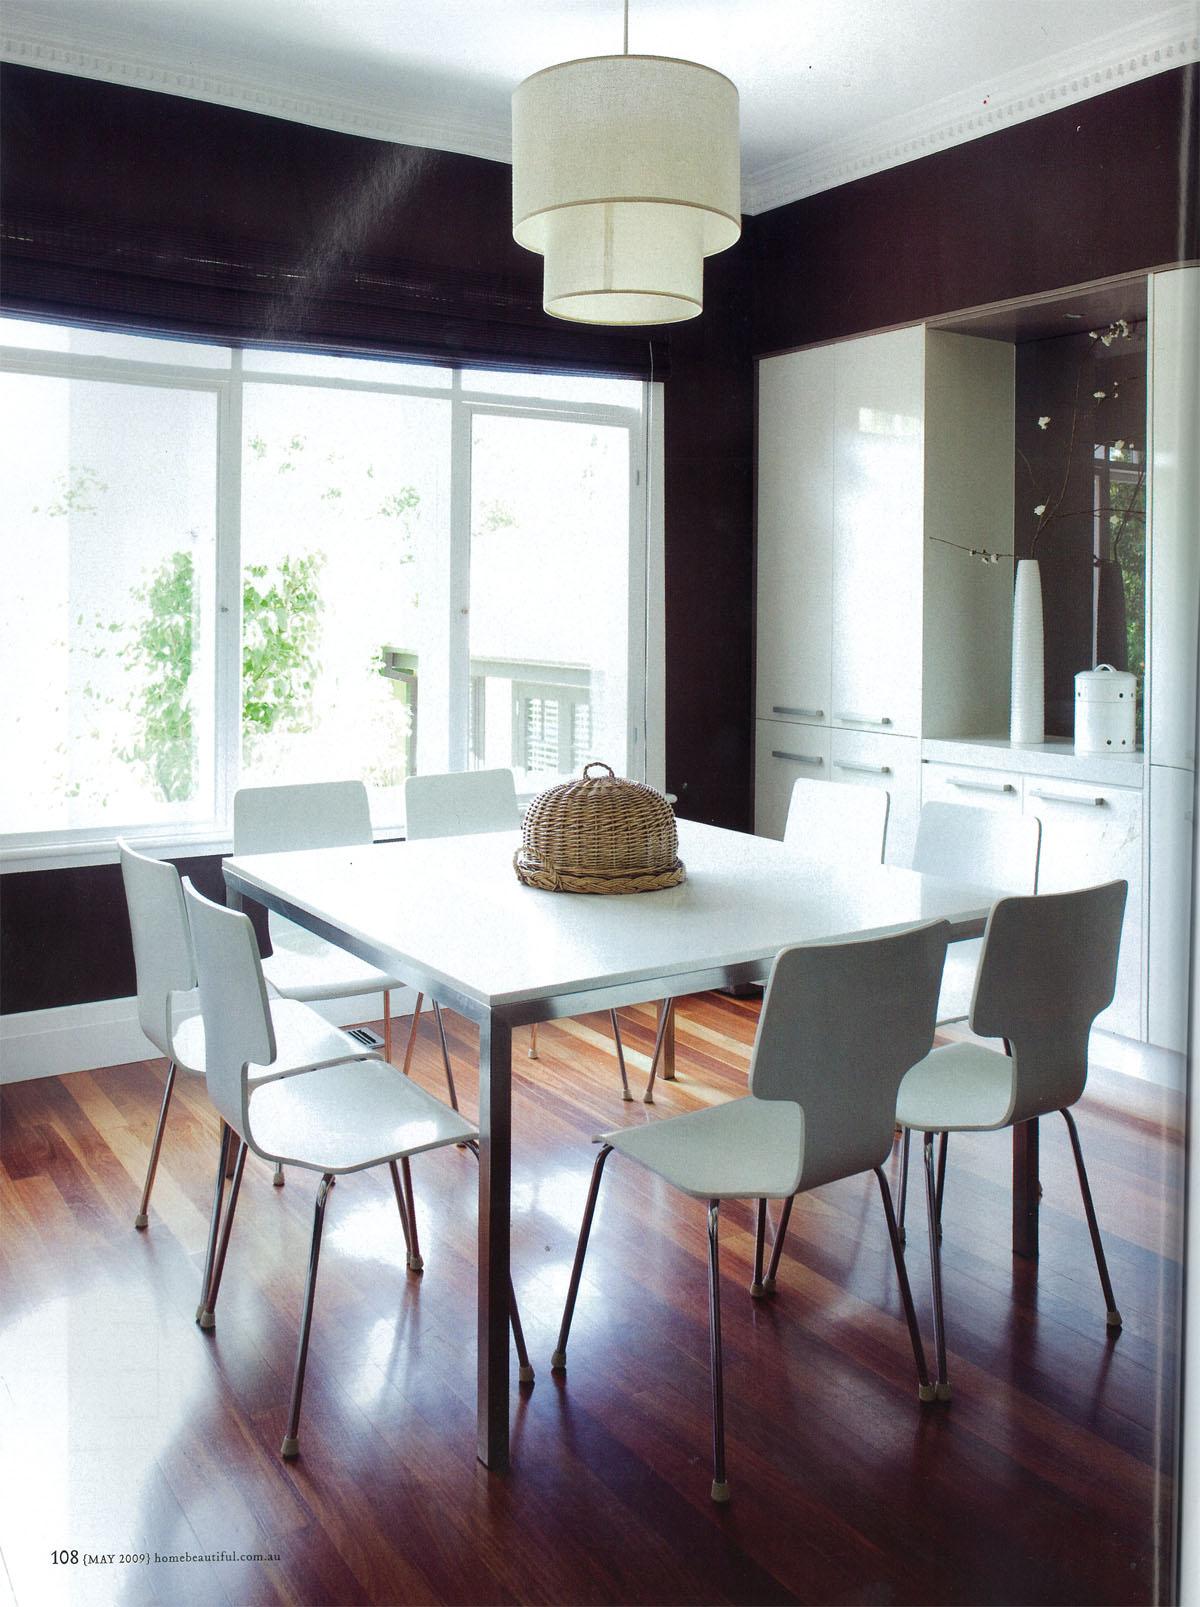 Lynne Bradley Interiors featured in Australian Home Beautiful